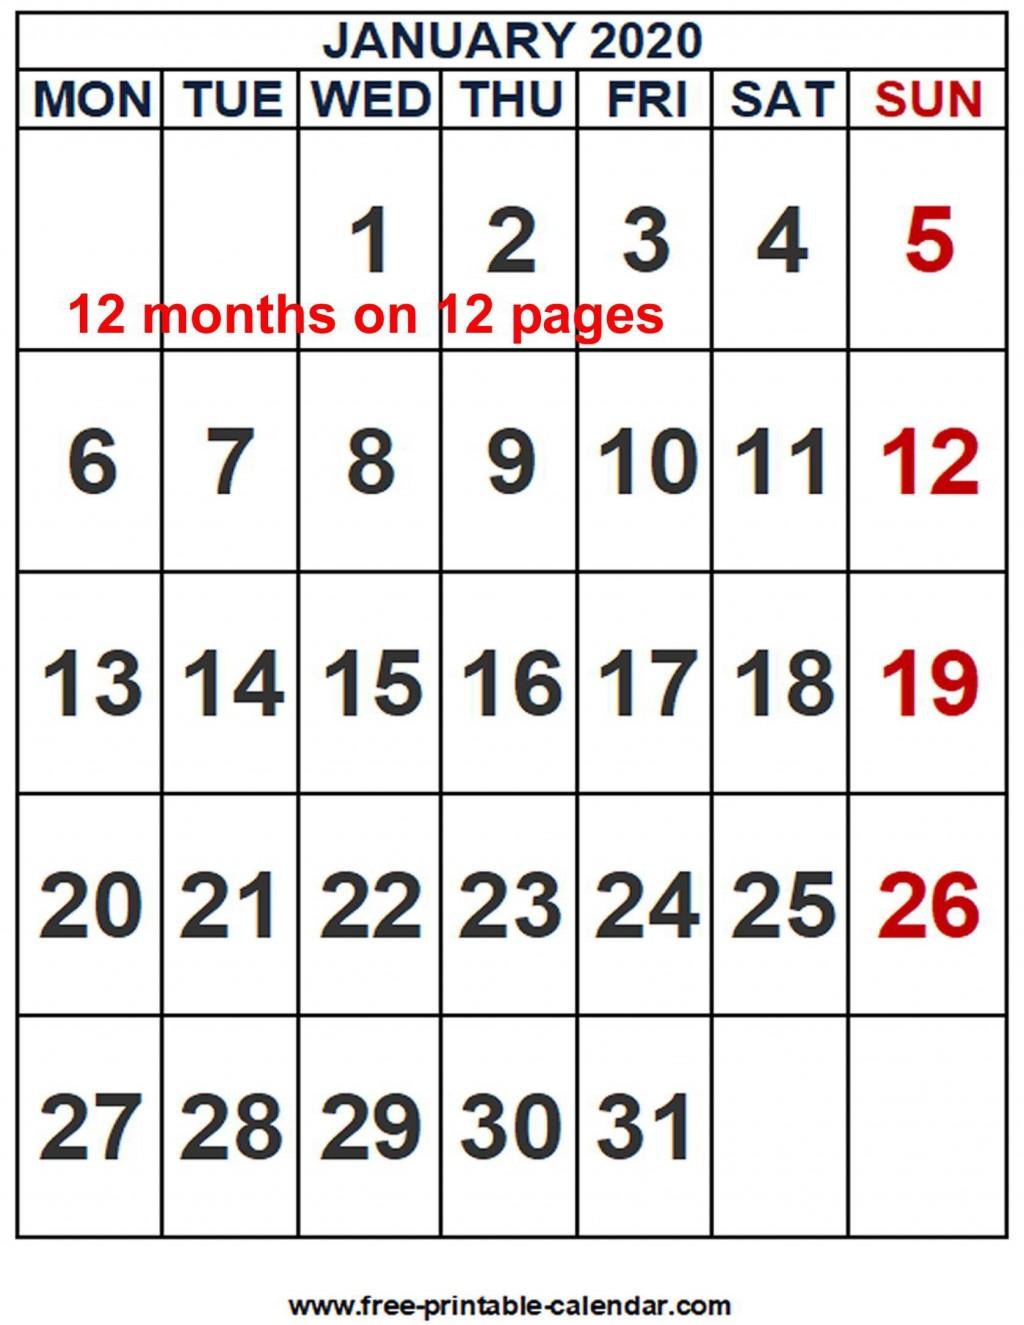 002 Striking Word 2020 Monthly Calendar Template Inspiration  Uk FreeLarge